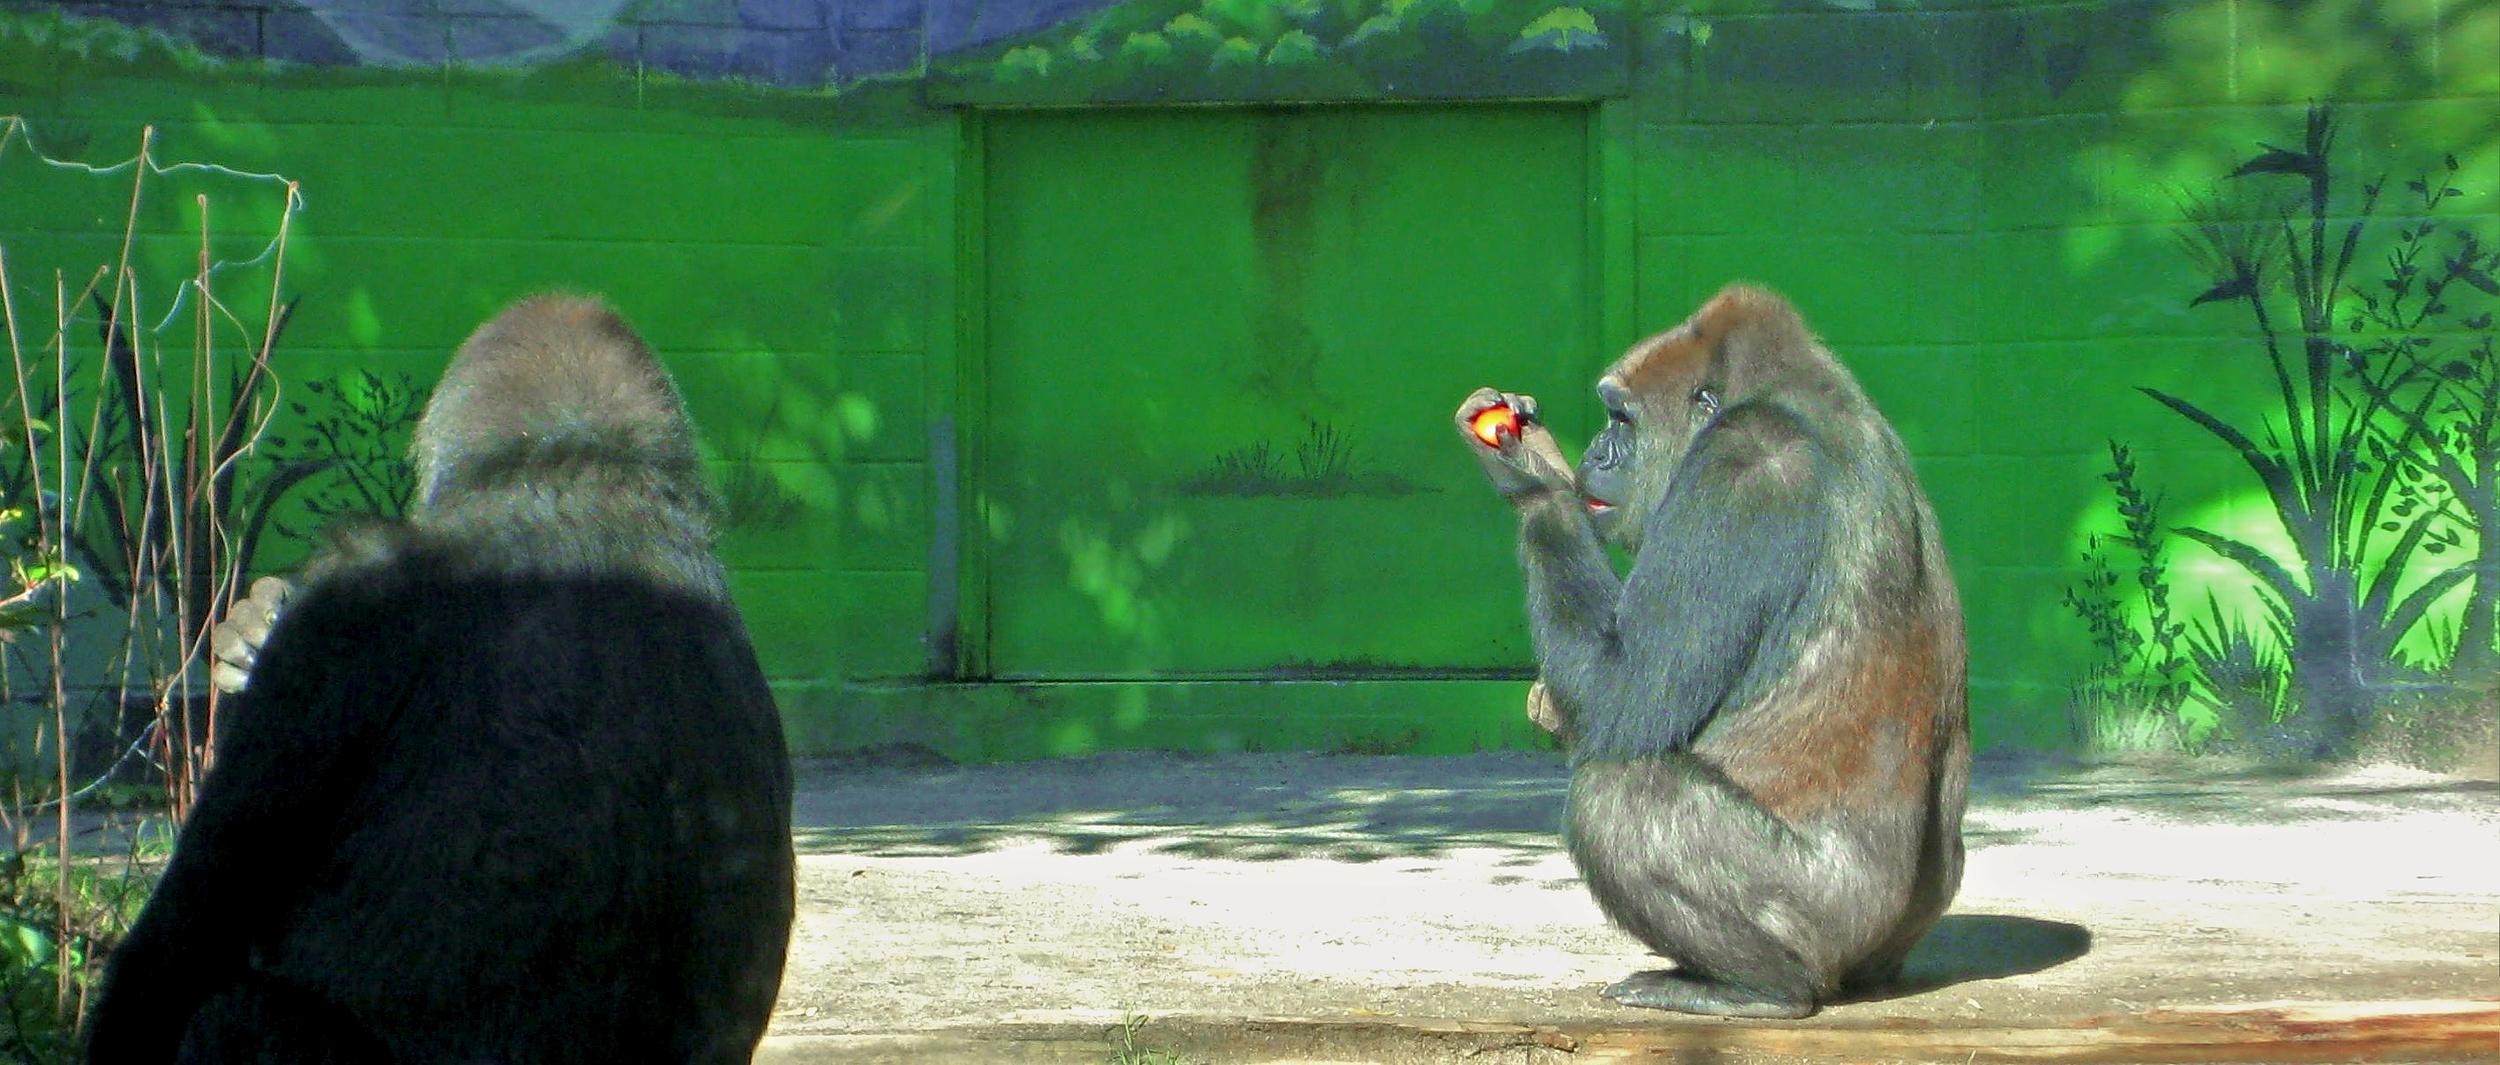 San Diego Zoo, San Diego, California